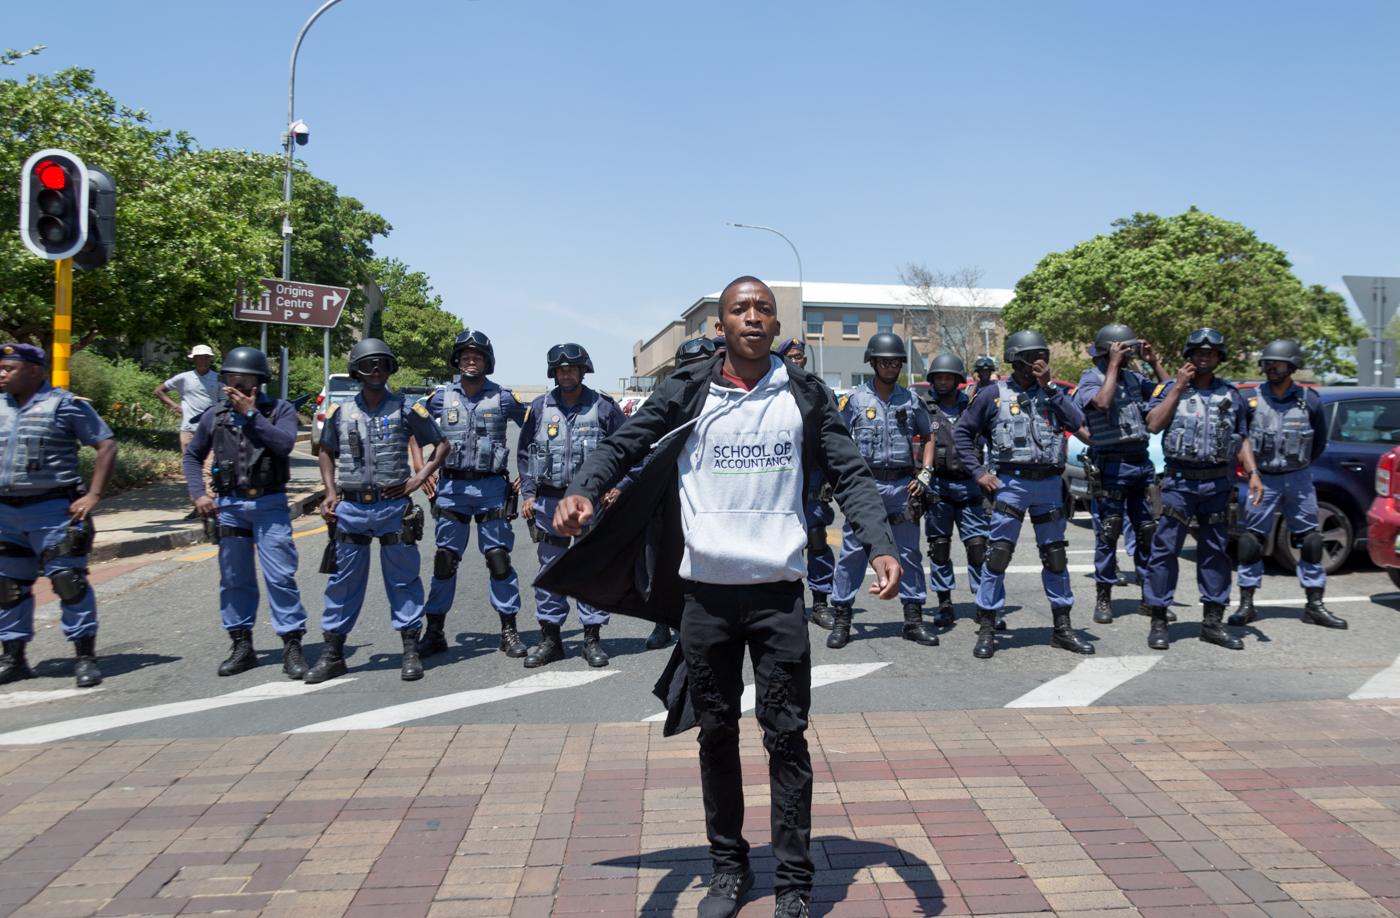 wits feesmustfall protest 10 october 2016 braamfontein